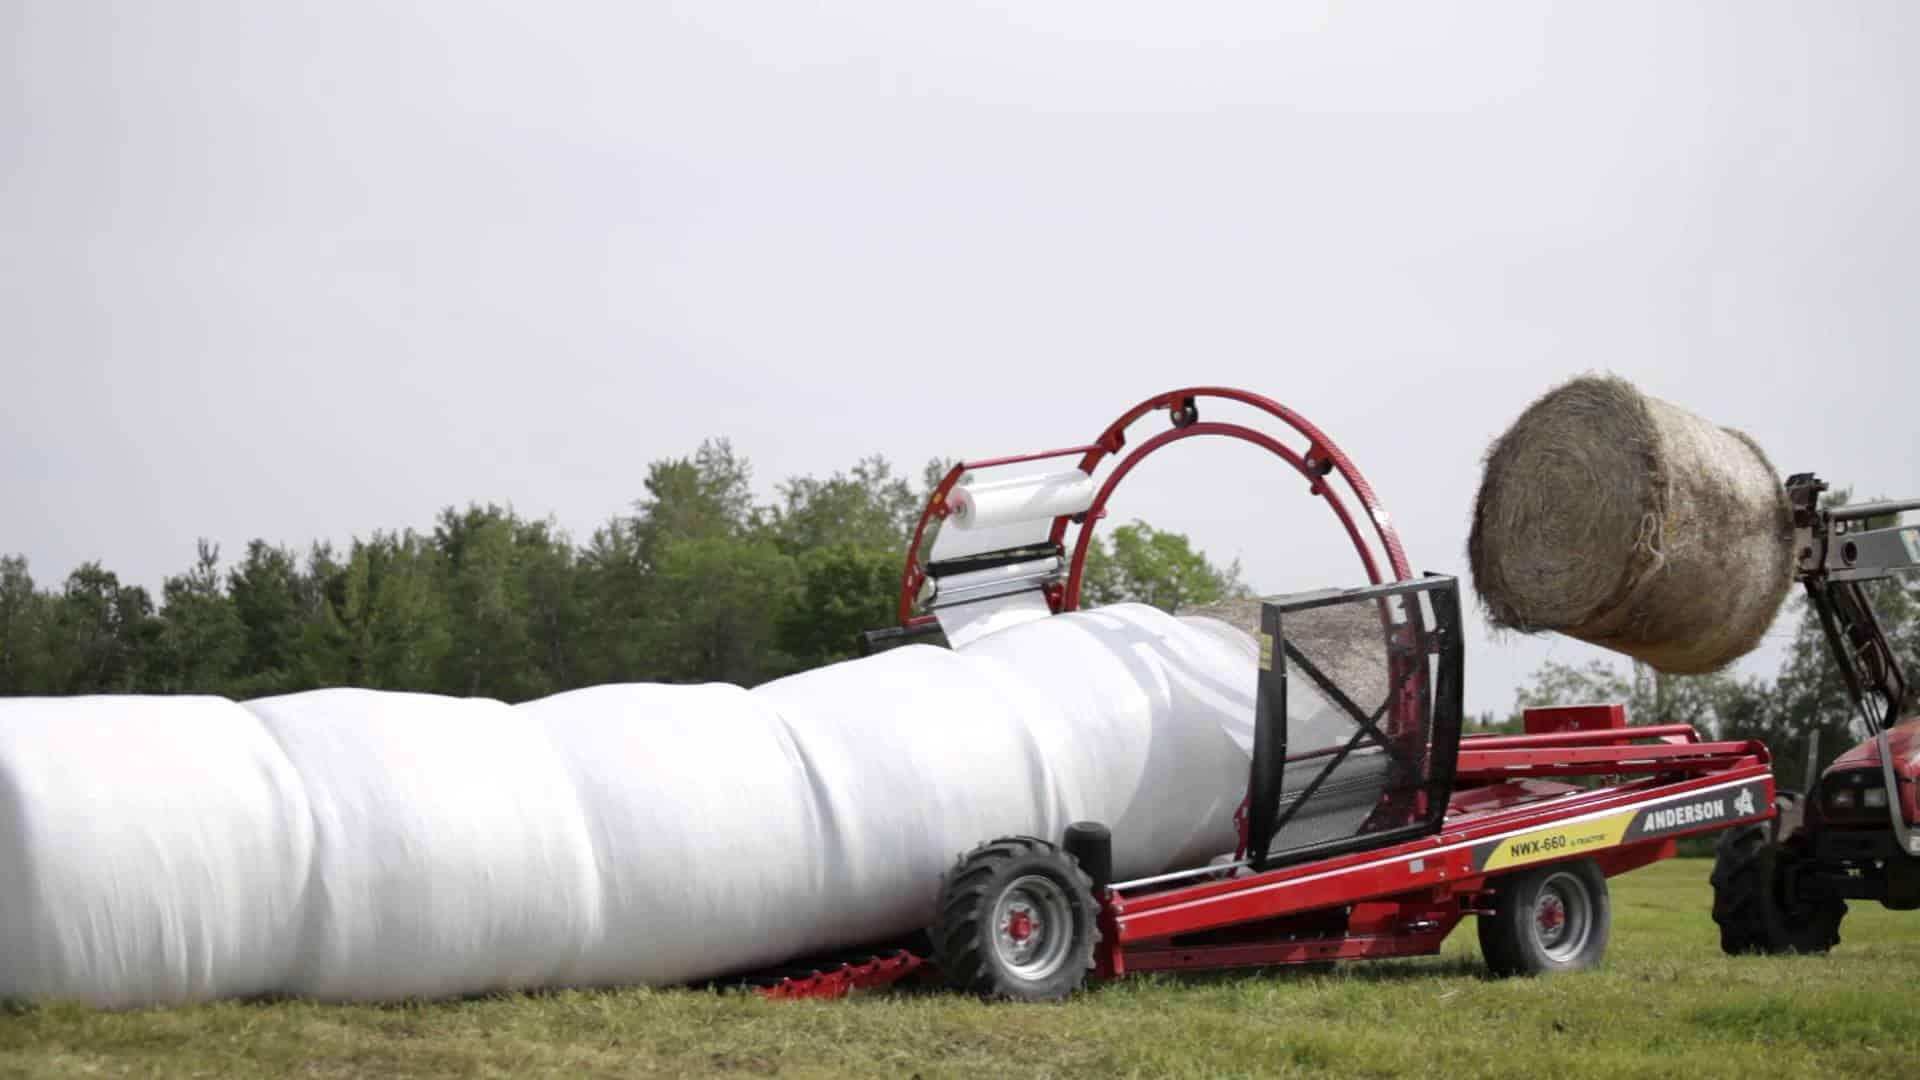 Агрострейч-пленка для упаковки и хранения сенажа